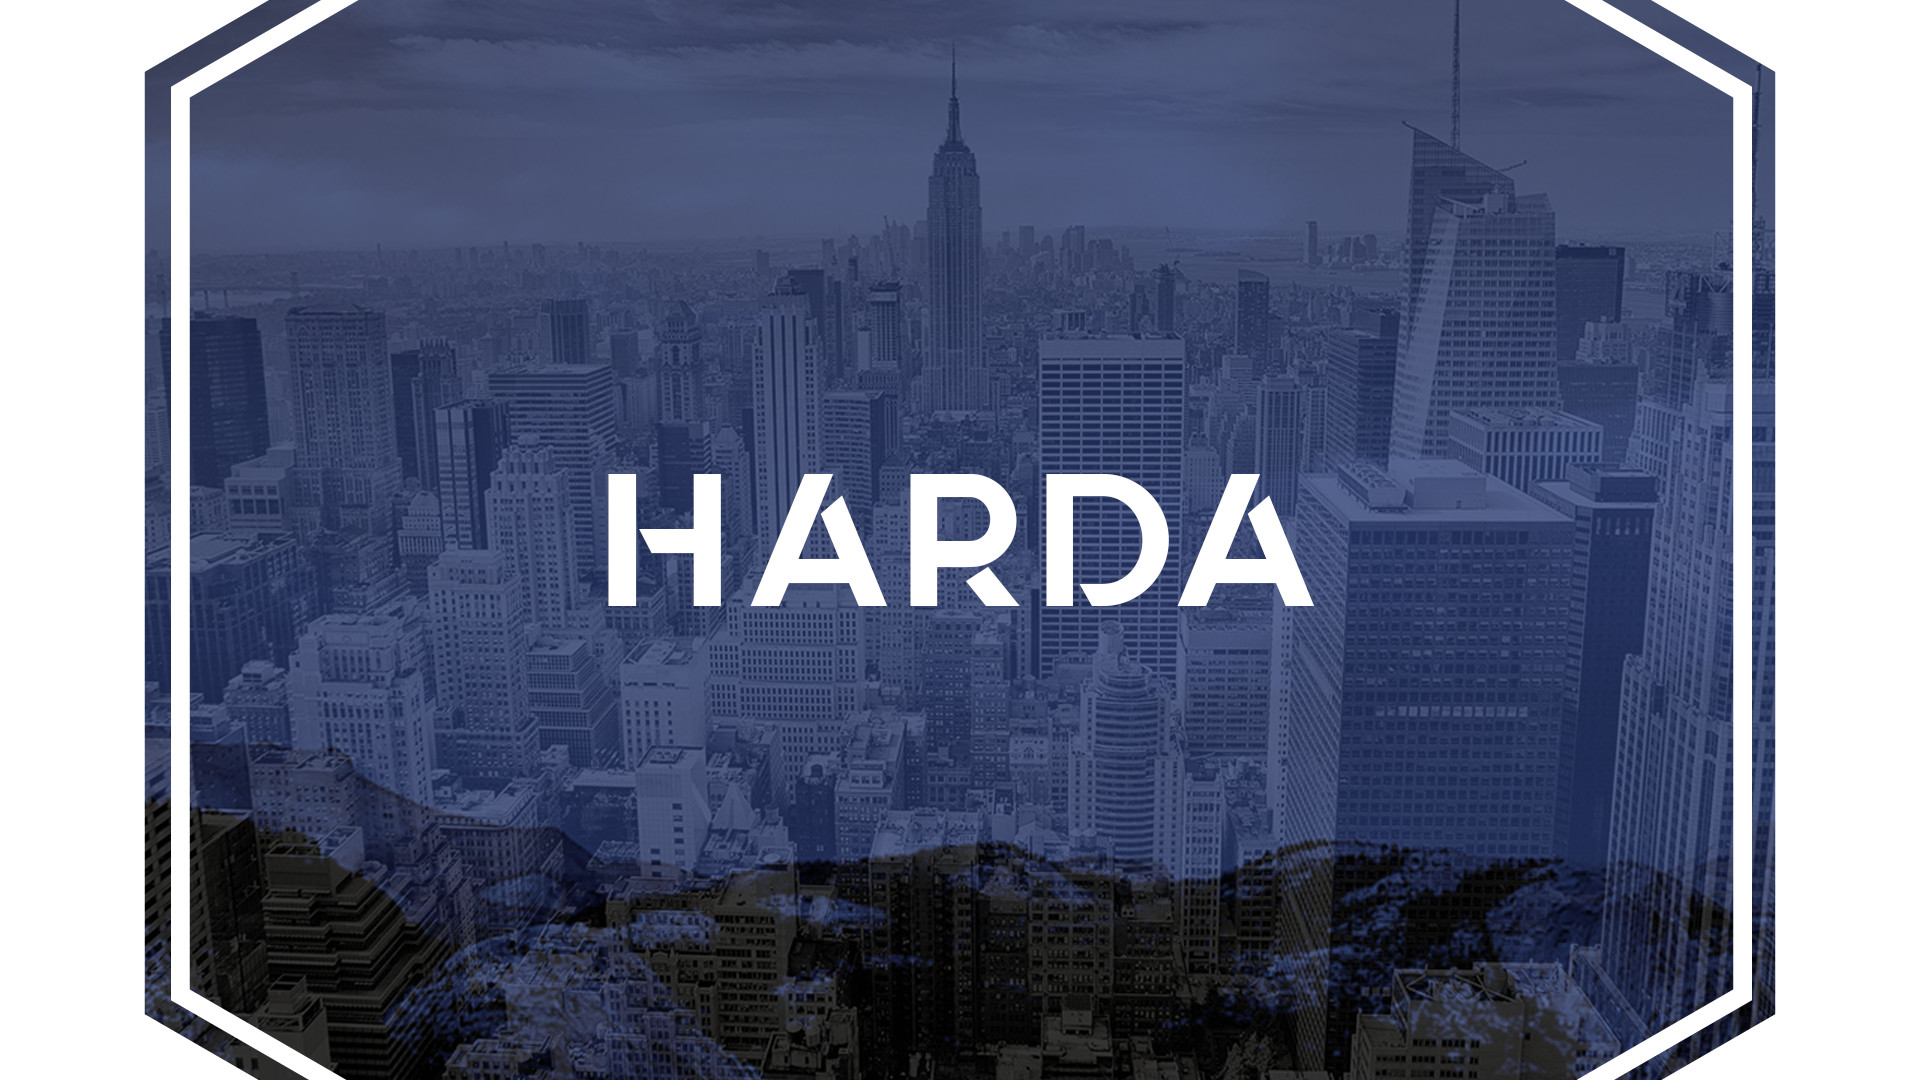 Miniature HARDA